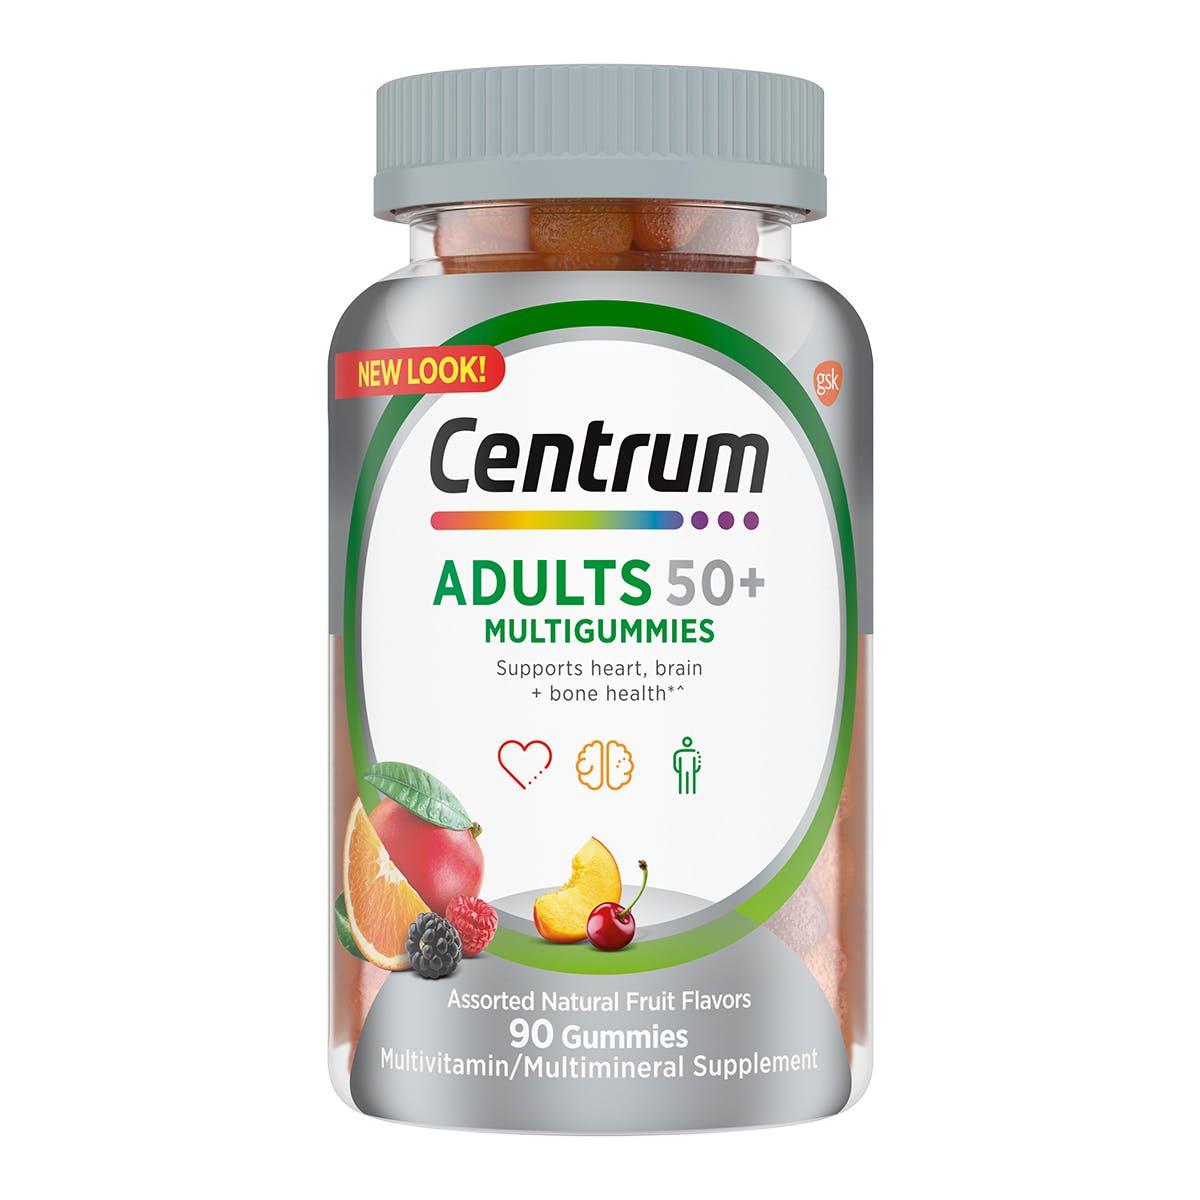 Bottle of Centrum Multigummies Adults 50plus